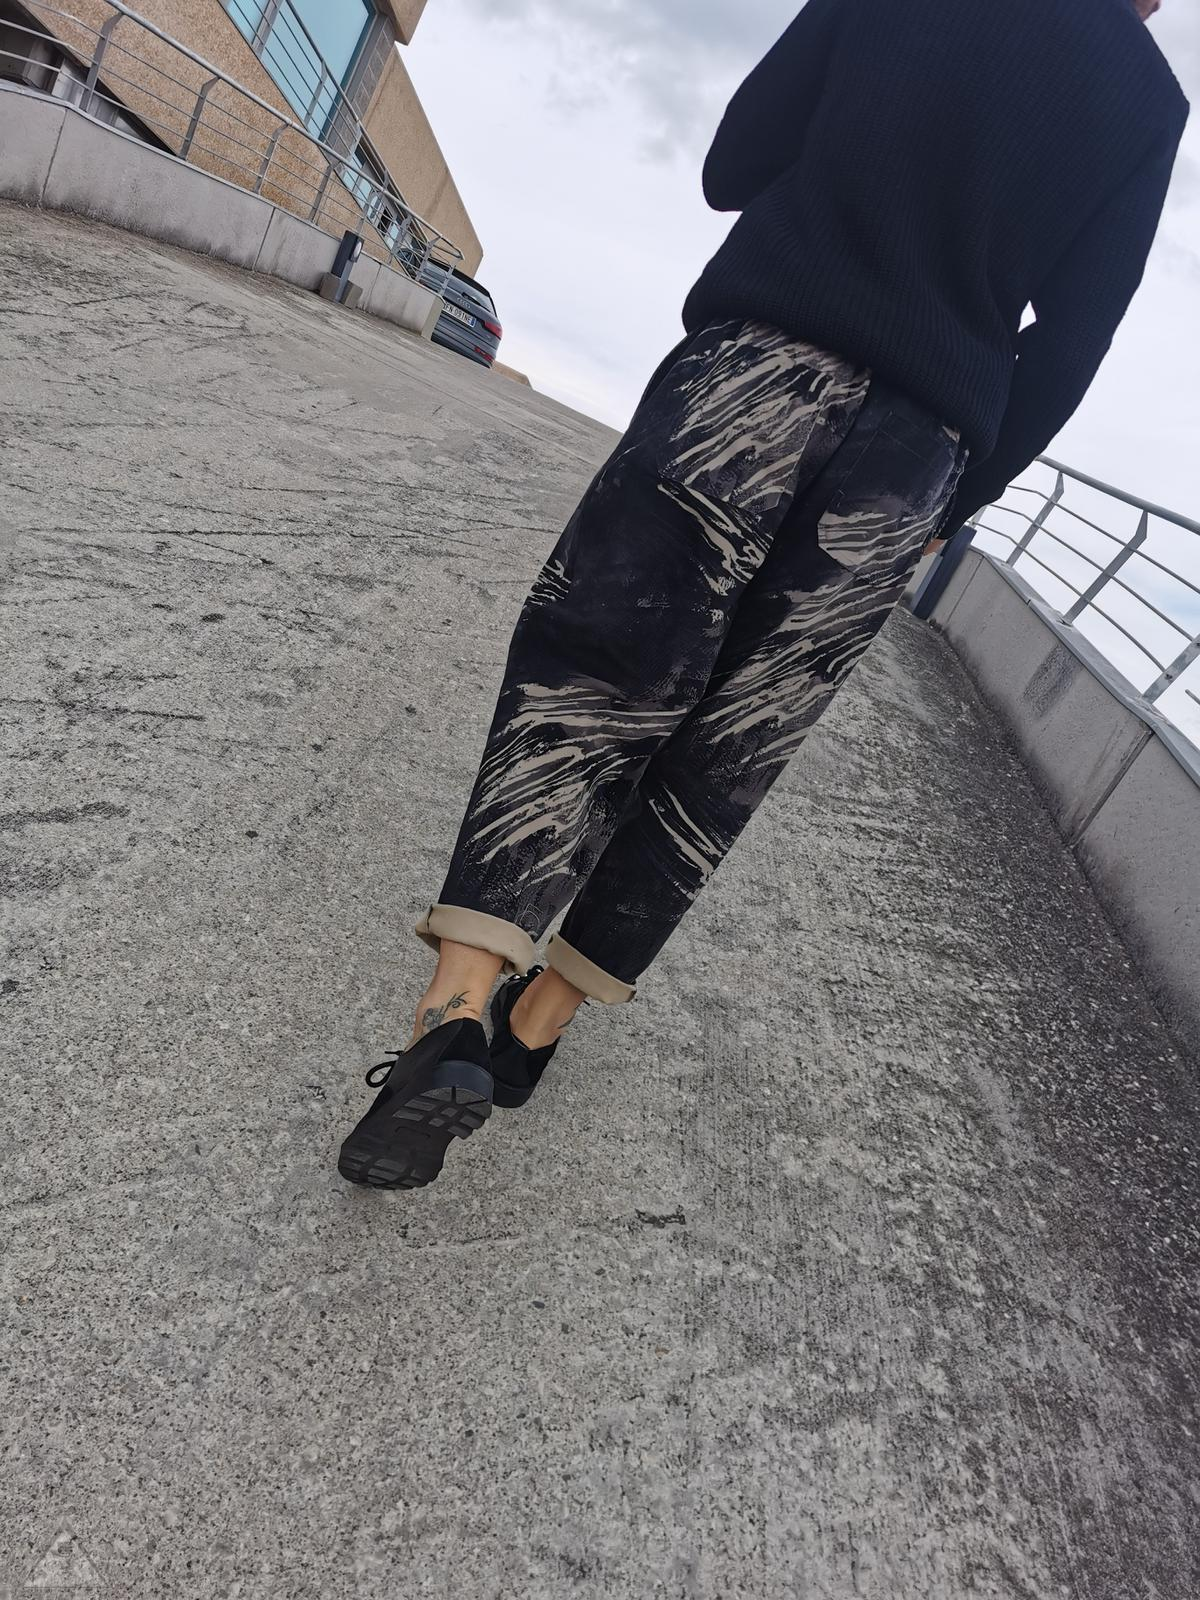 Panta Pence Graffio